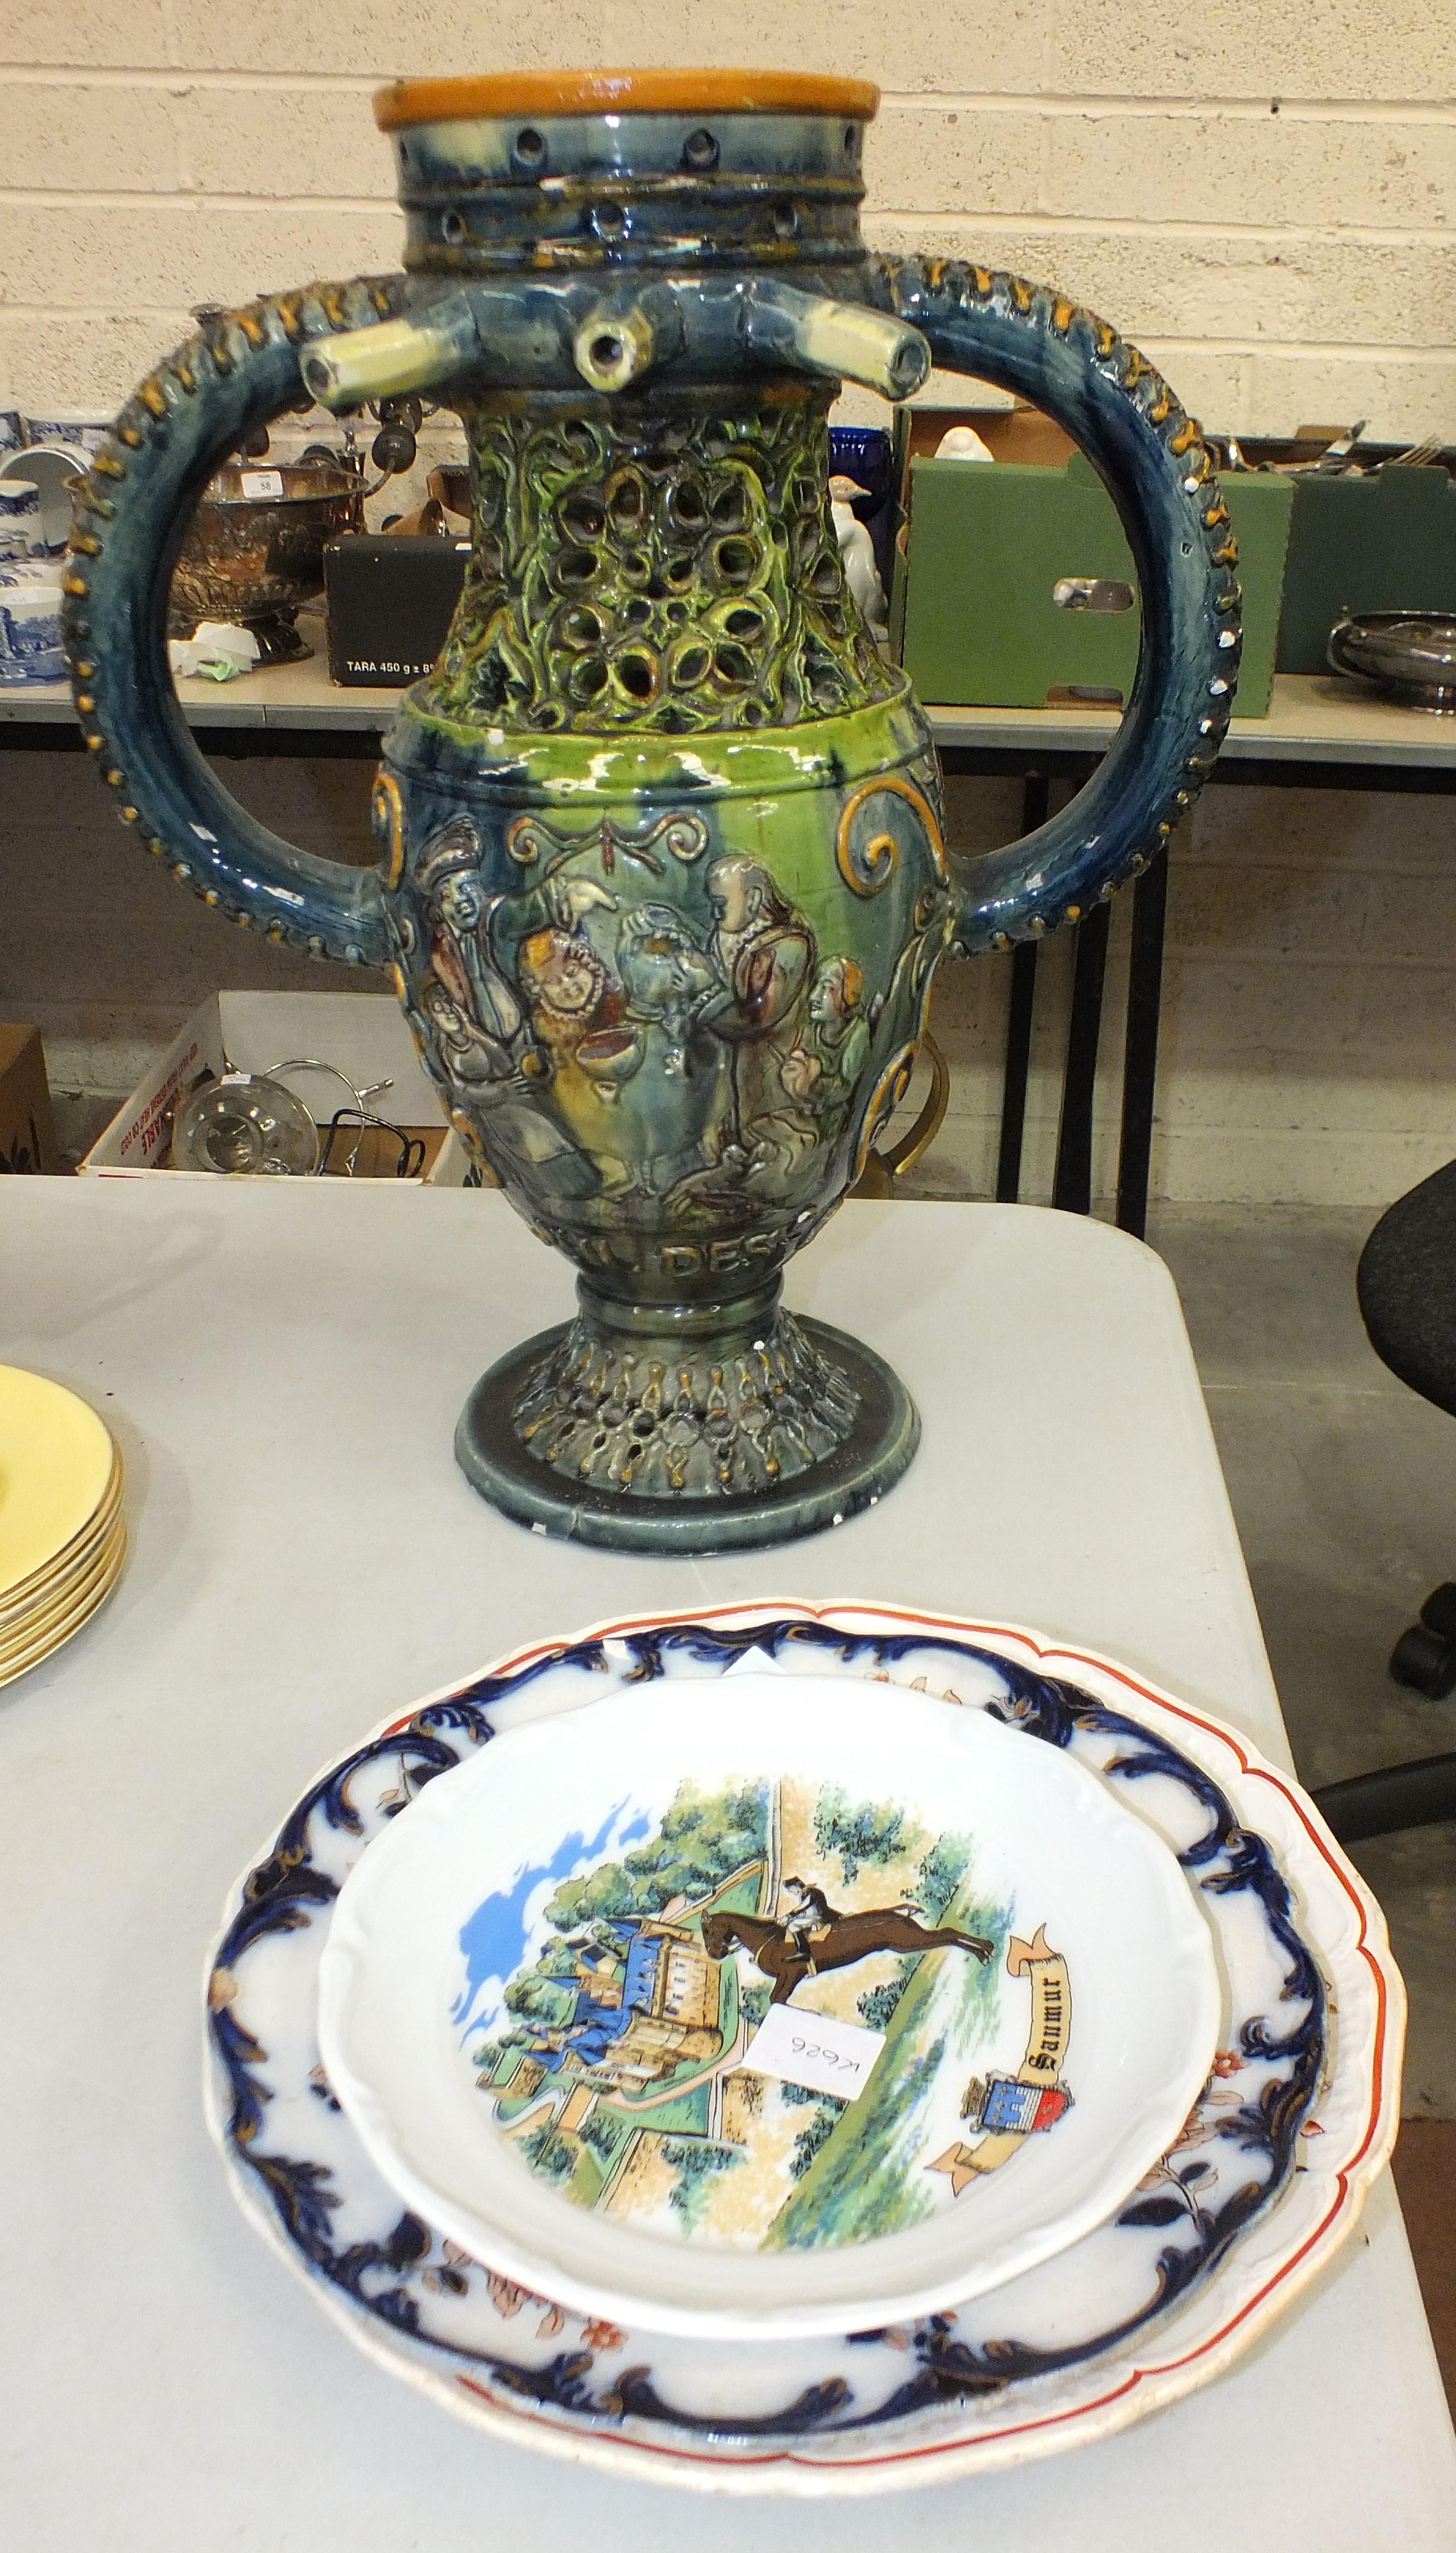 Lot 98 - A majolica puzzle jug, (a/f), 42cm high and four ceramic plates, (5).